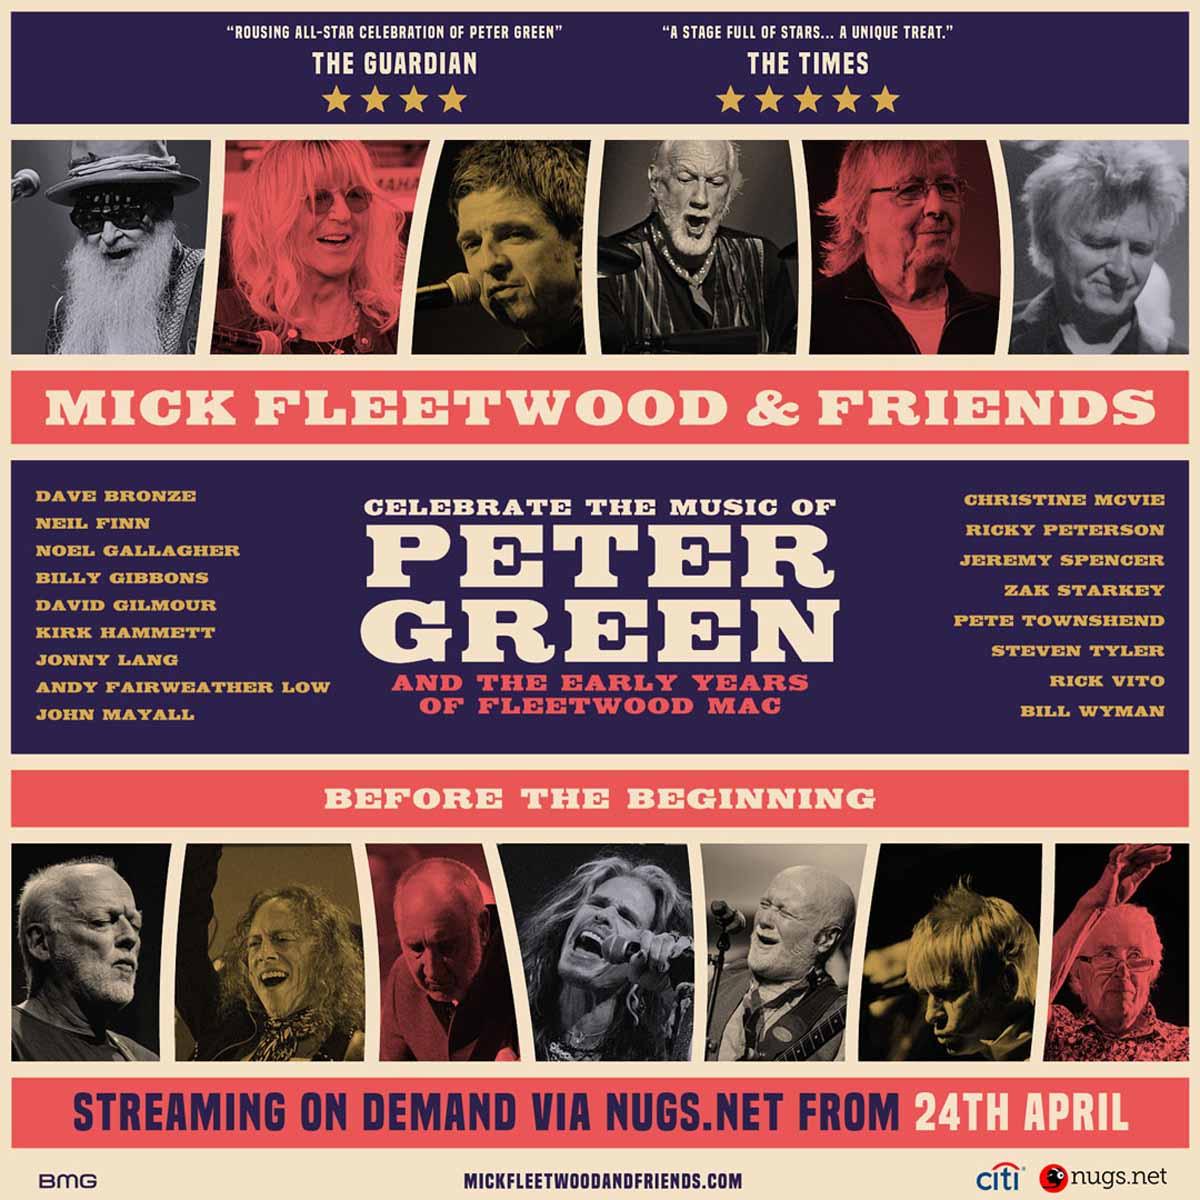 Mick Fleetwood & Friends se transmitirá en streaming